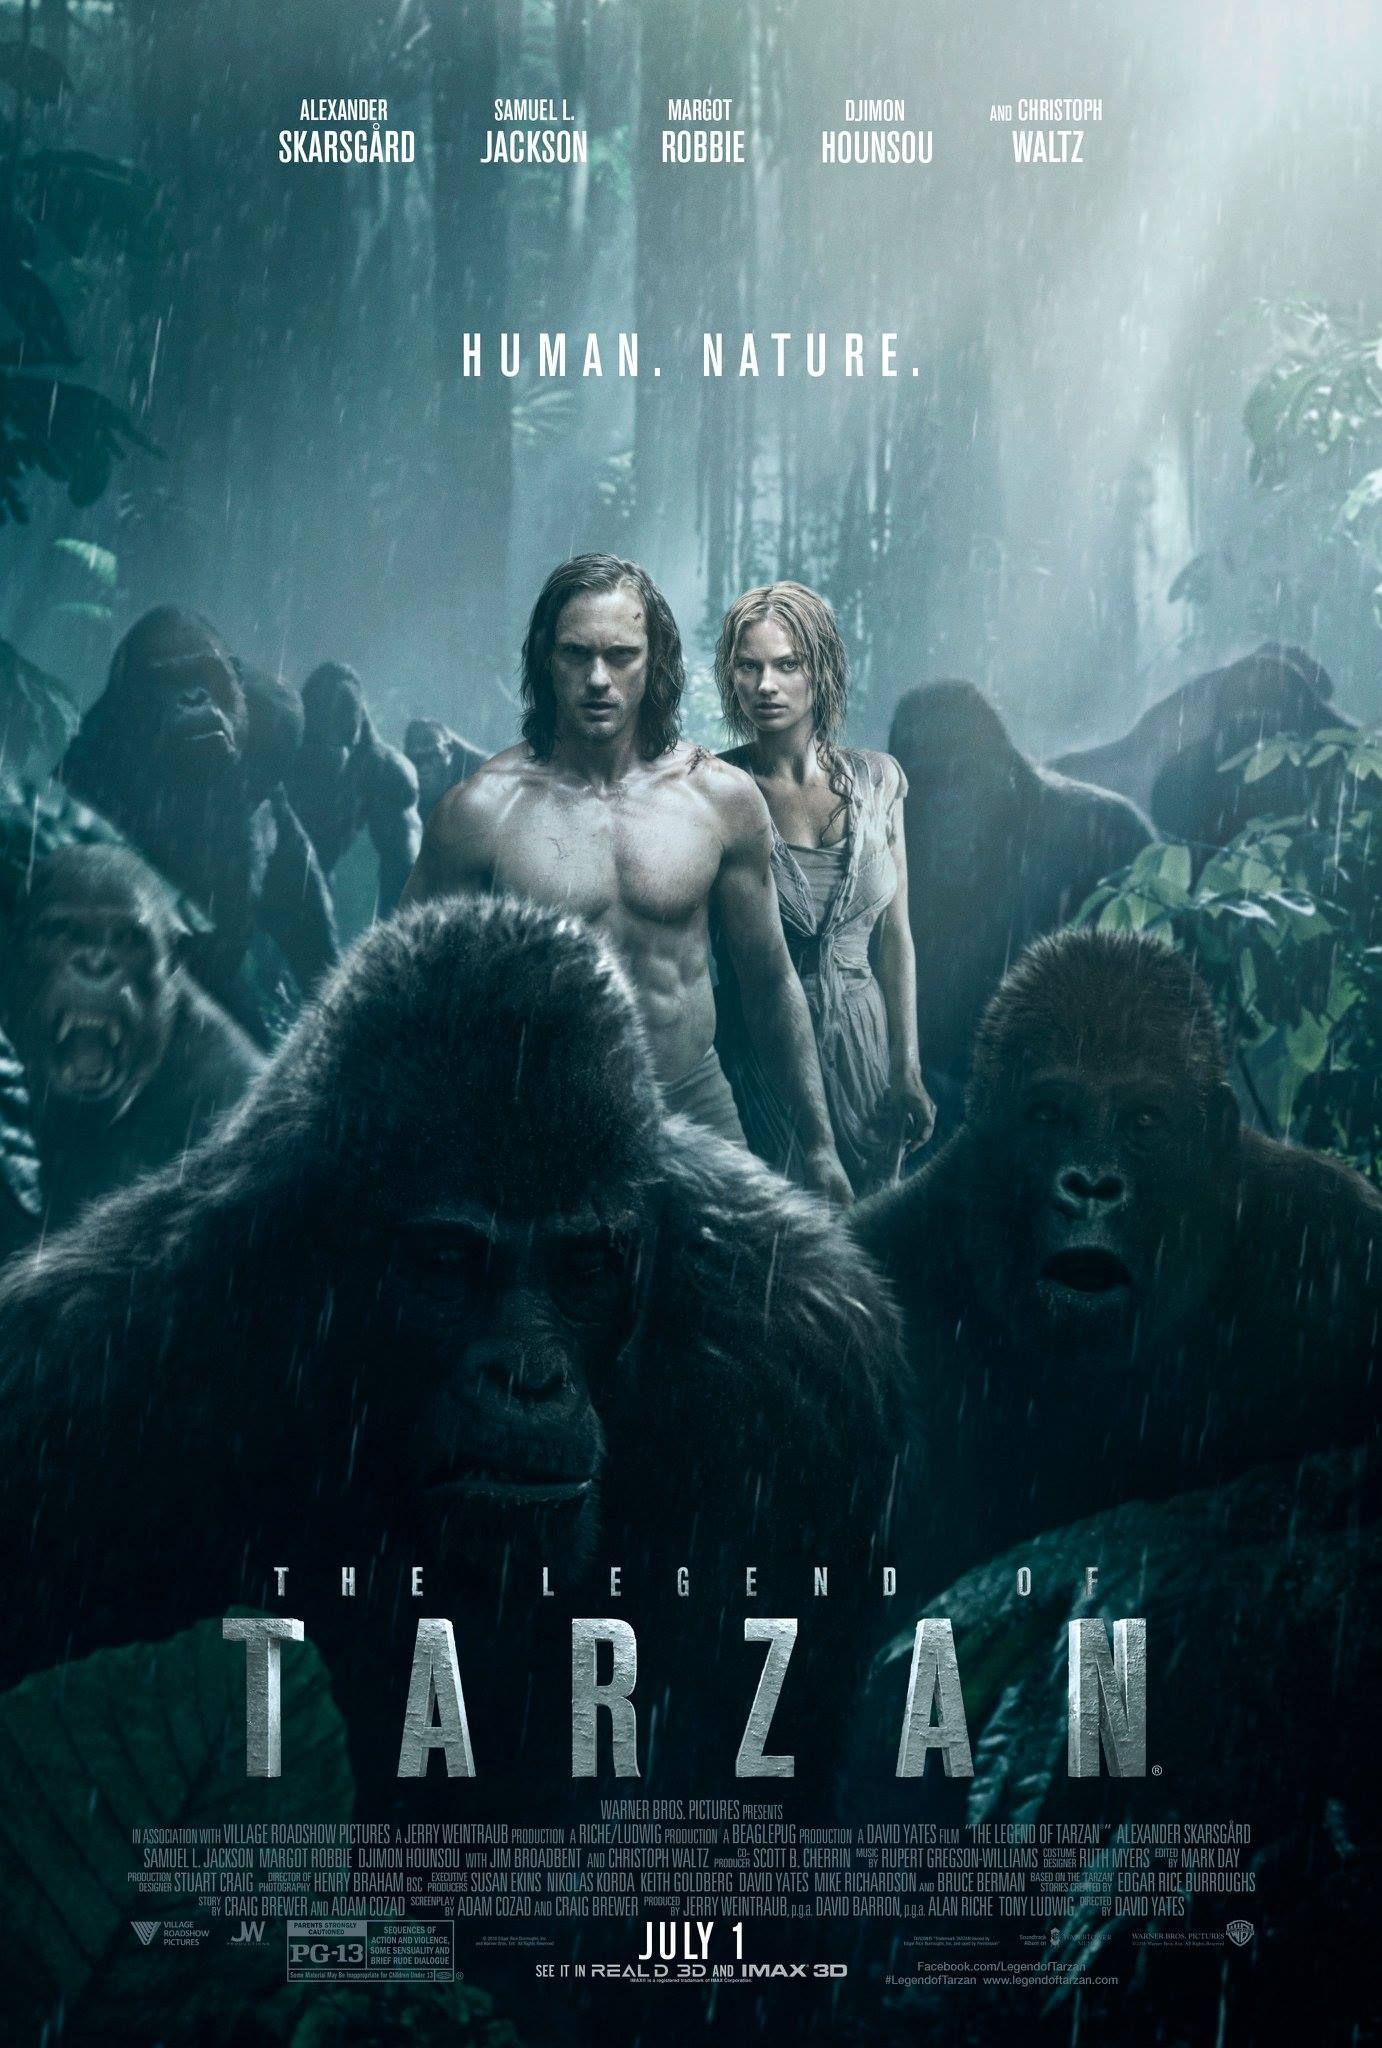 The Legend of Tarzan - ComingSoon net | Movie Posters em